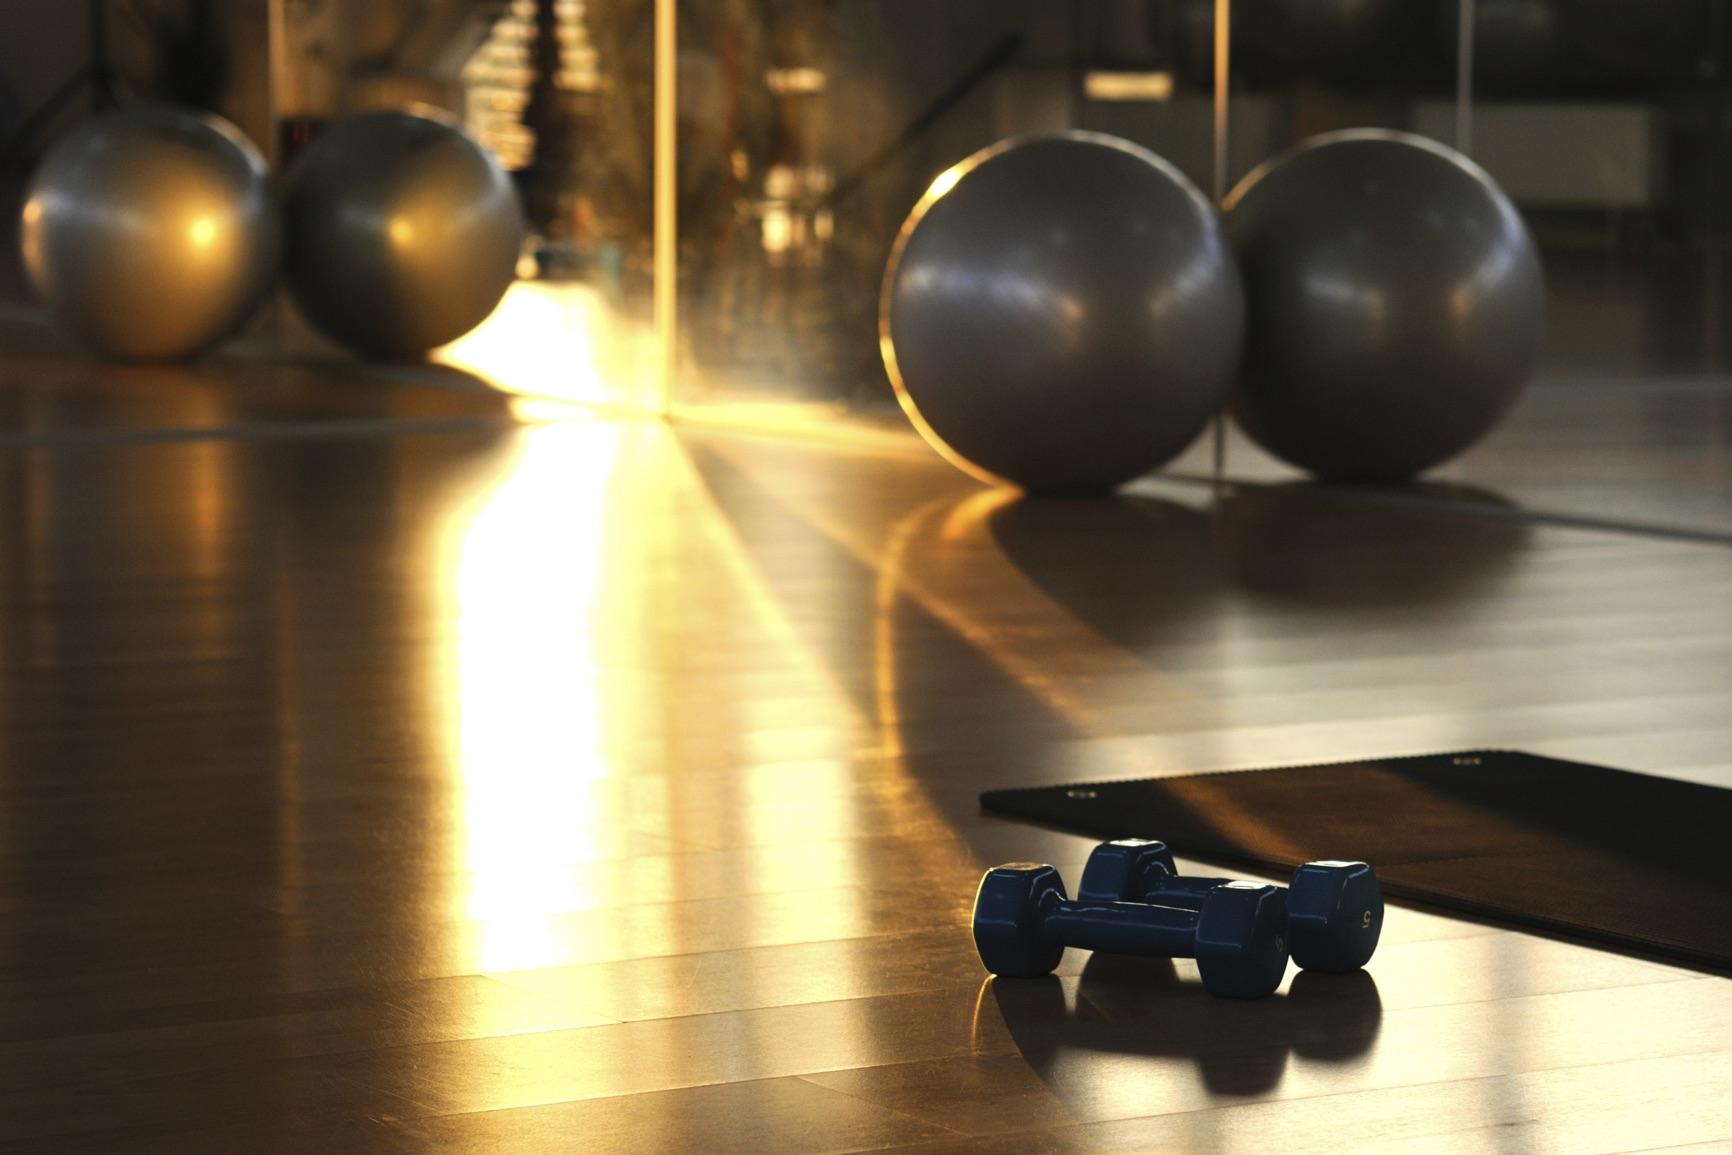 marthas-vineyard-group-fitness.jpg